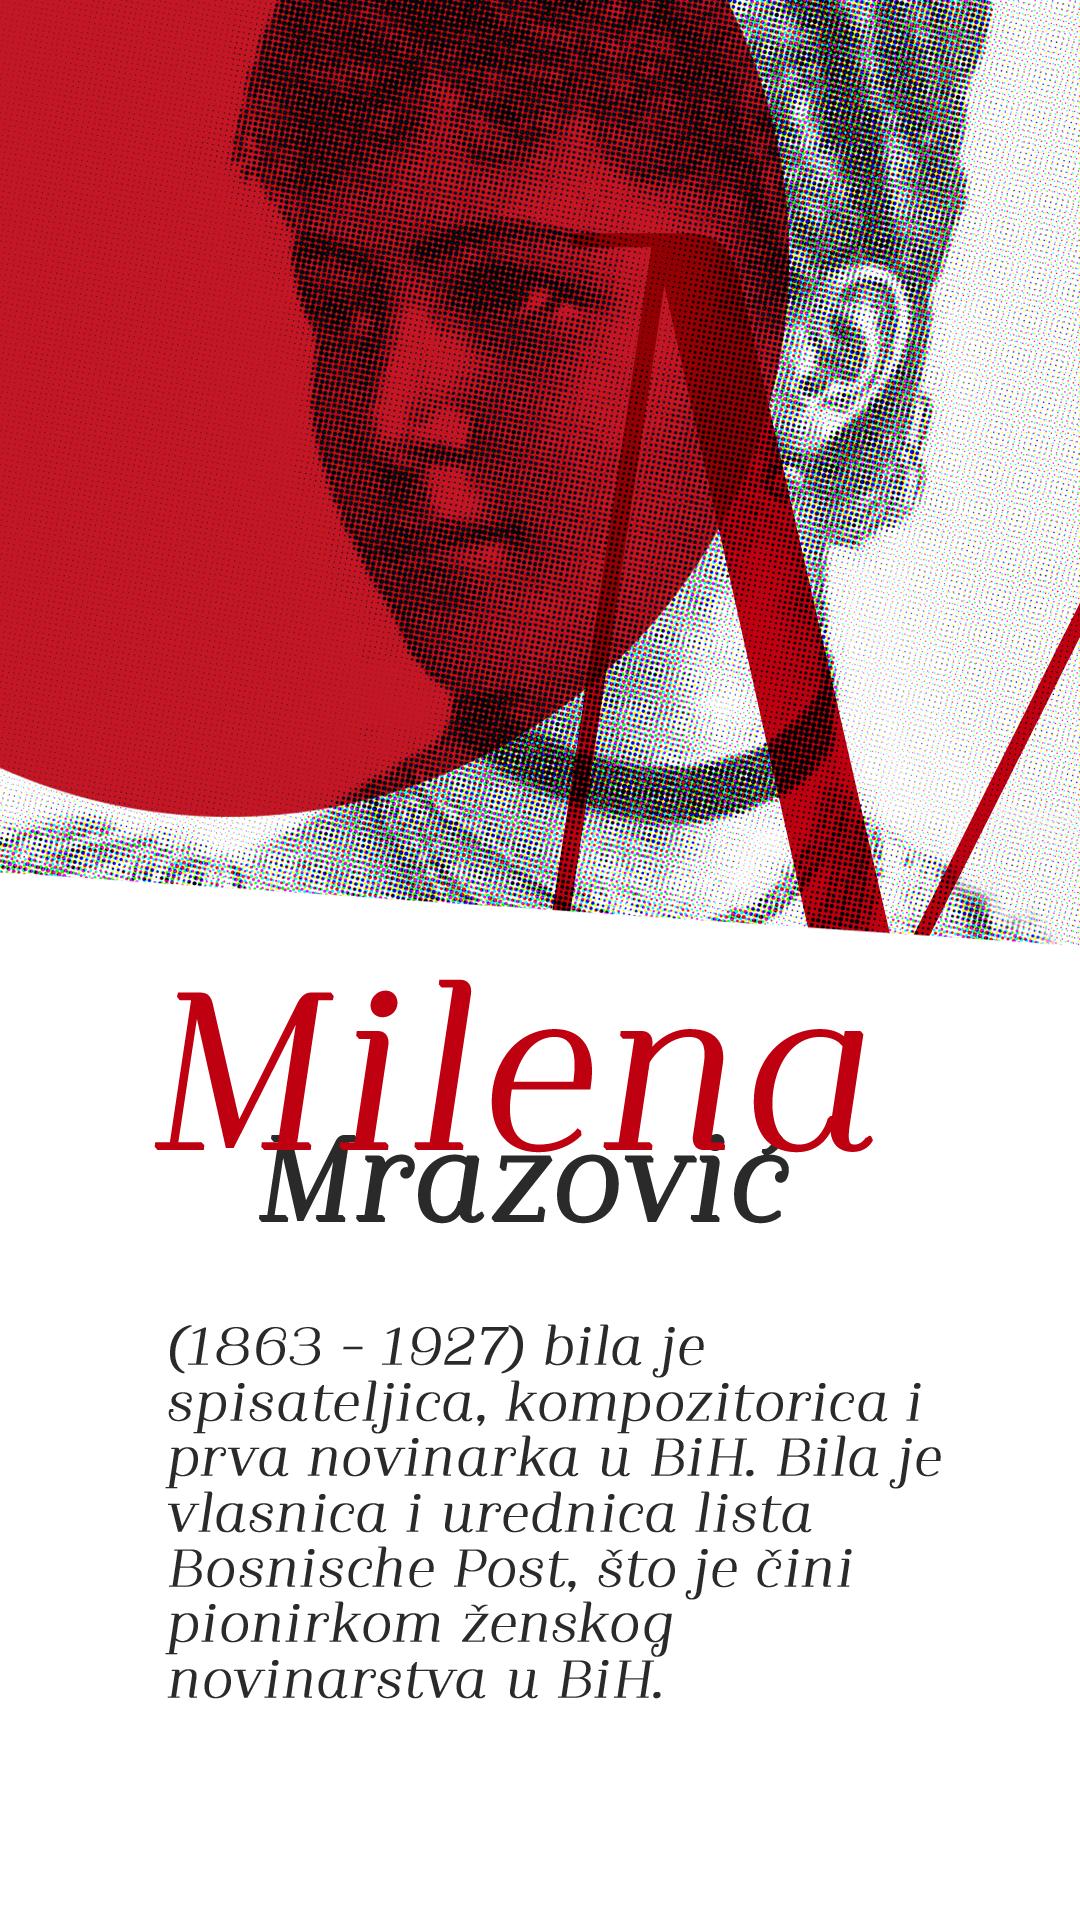 03 Milena Mrazovic